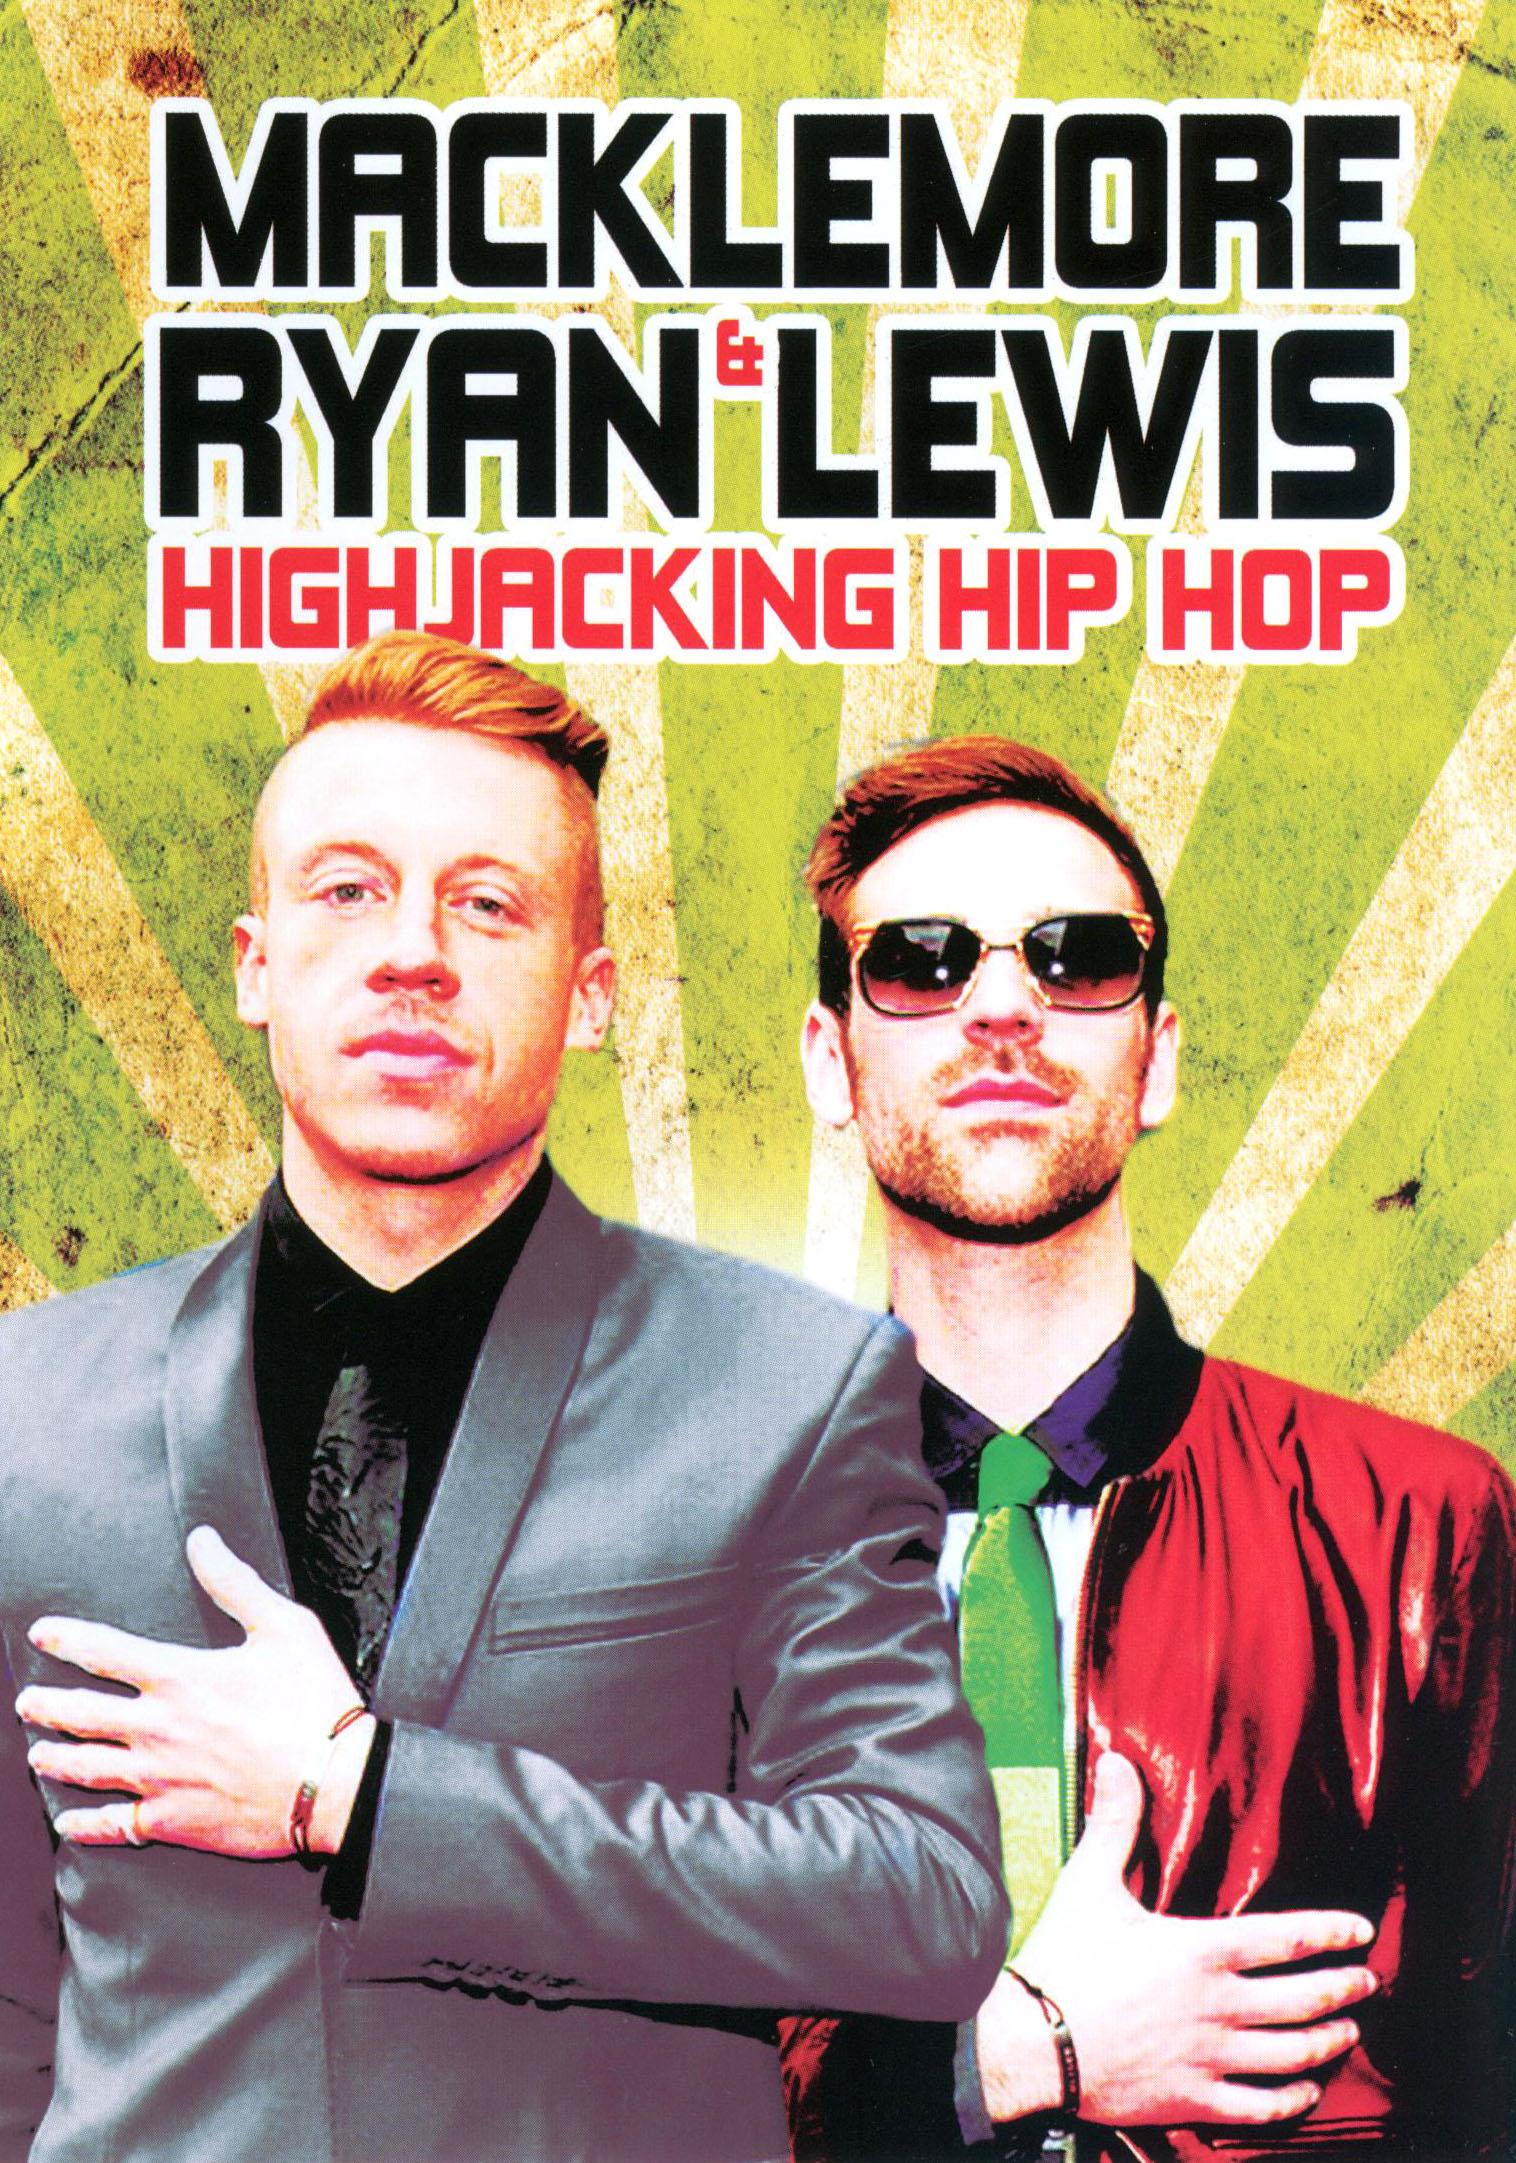 Macklemore & Ryan Lewis: Highjacking Hip Hop